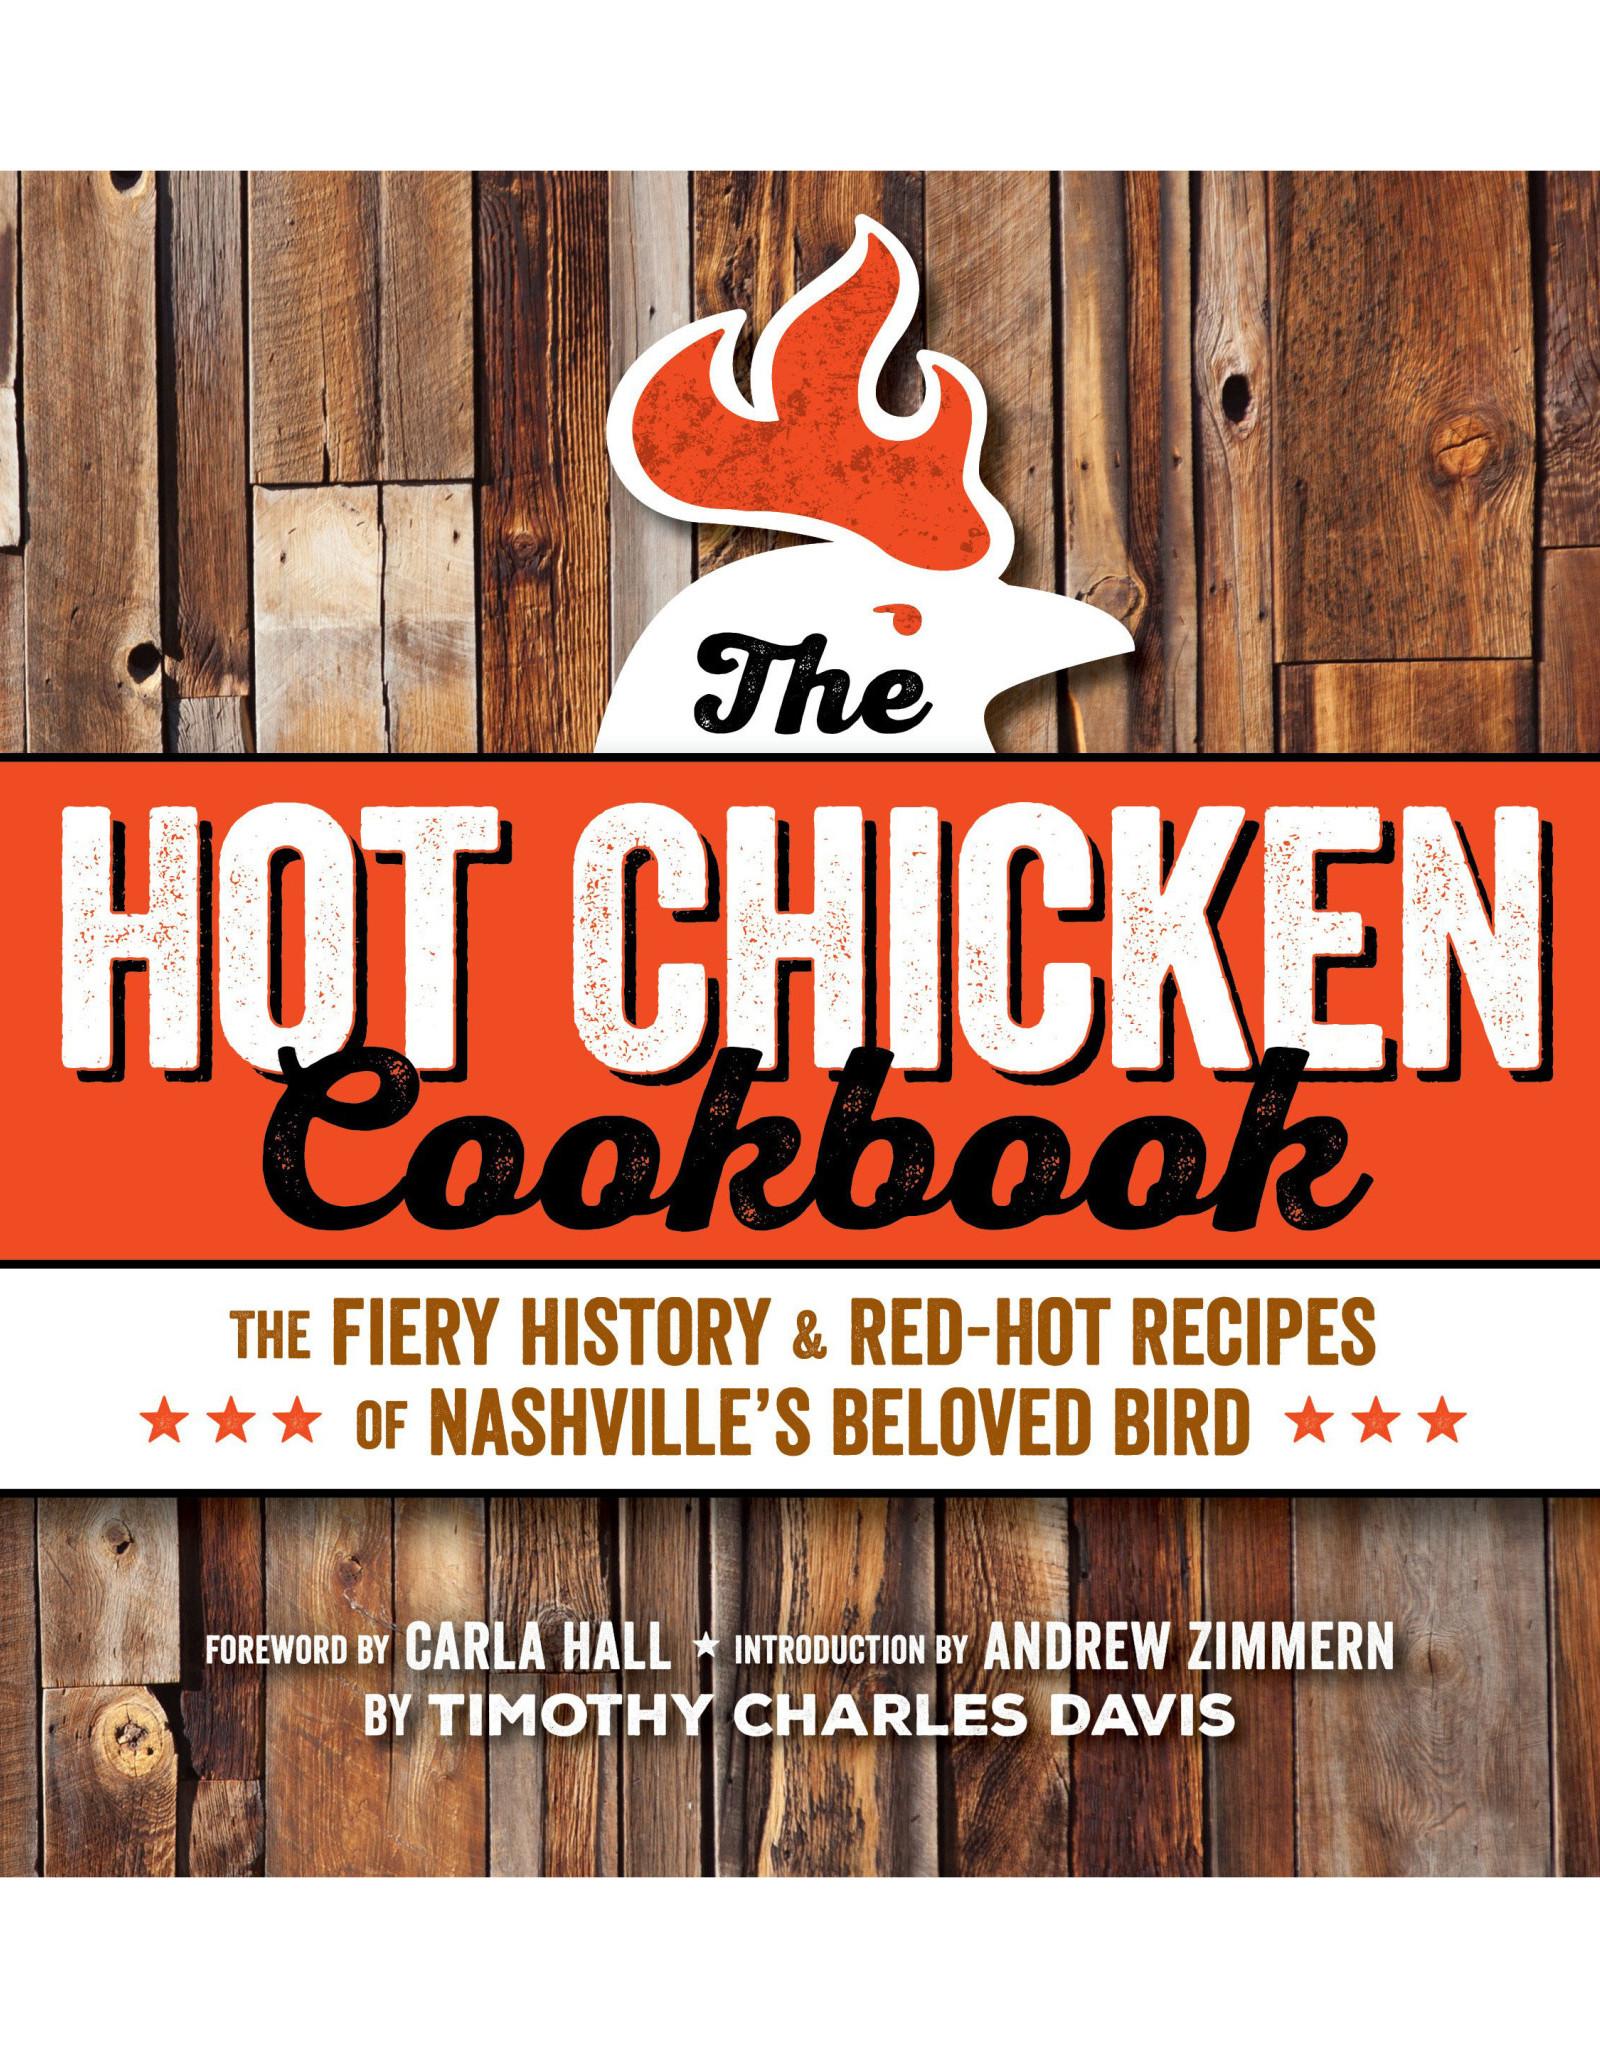 The Hot Chicken Cookbook